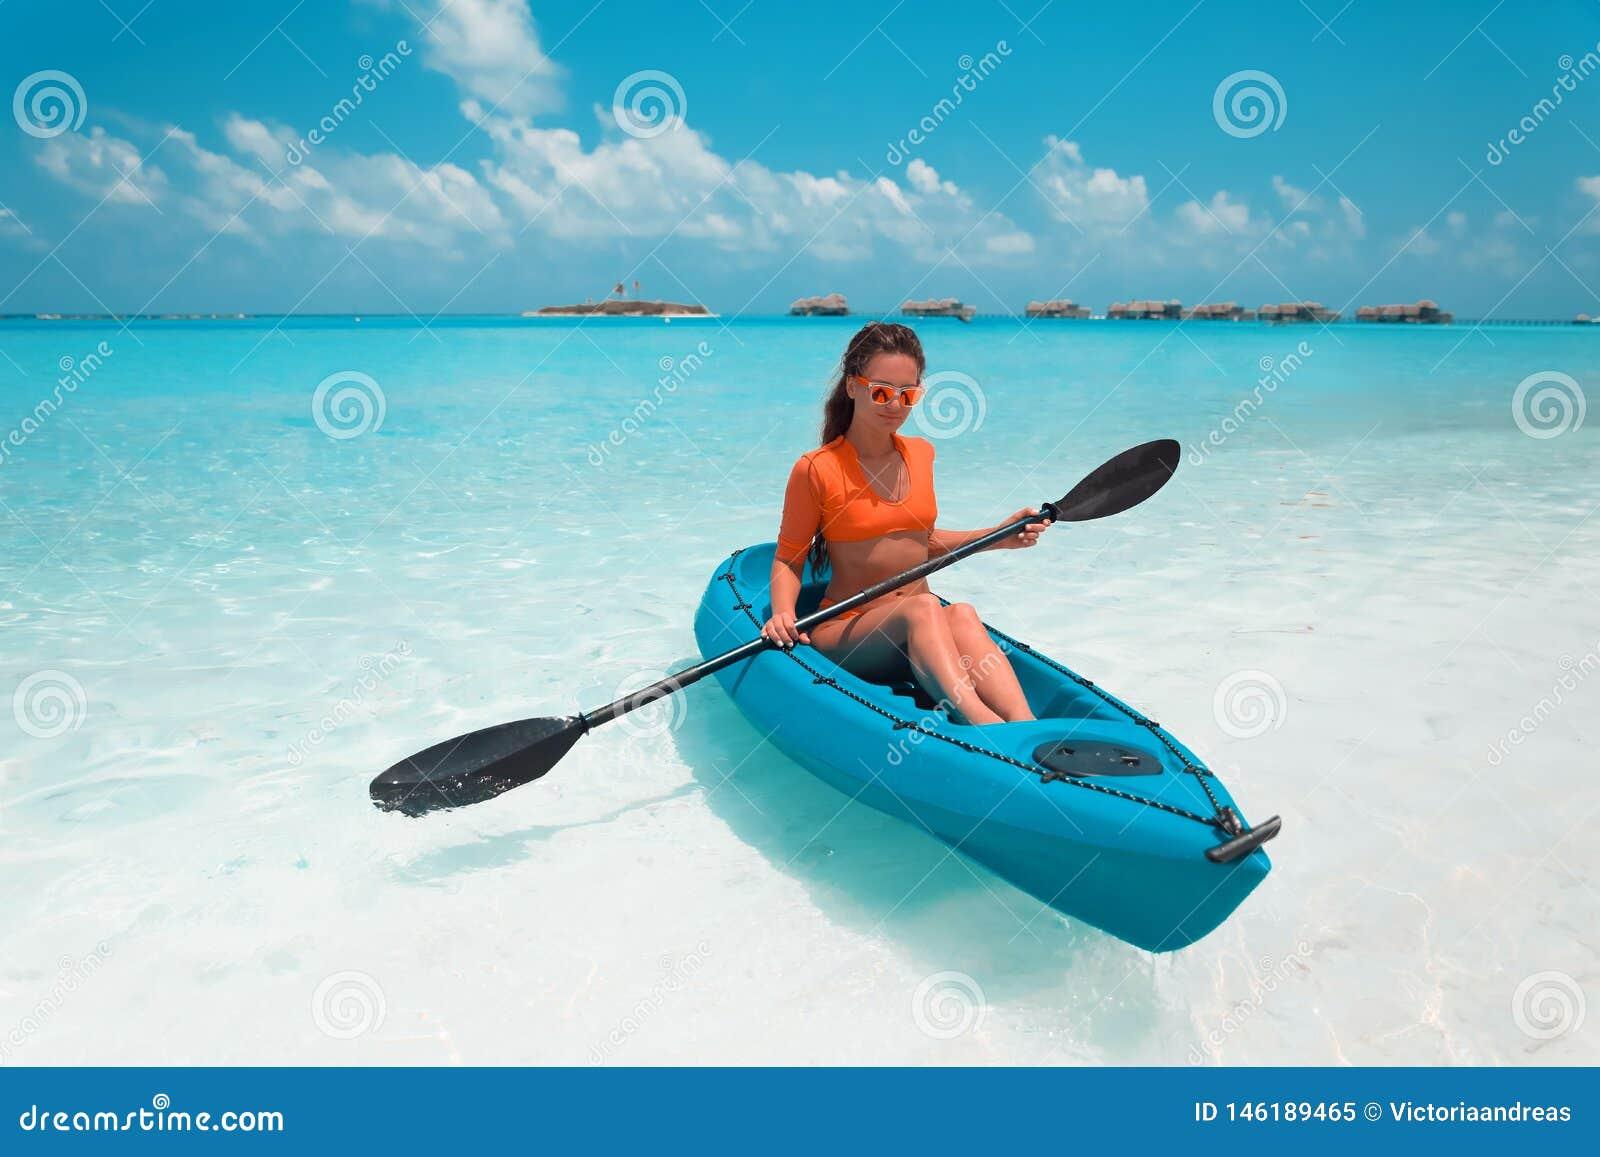 Brunette Paddling A Kayak  Woman Exploring Calm Tropical Bay